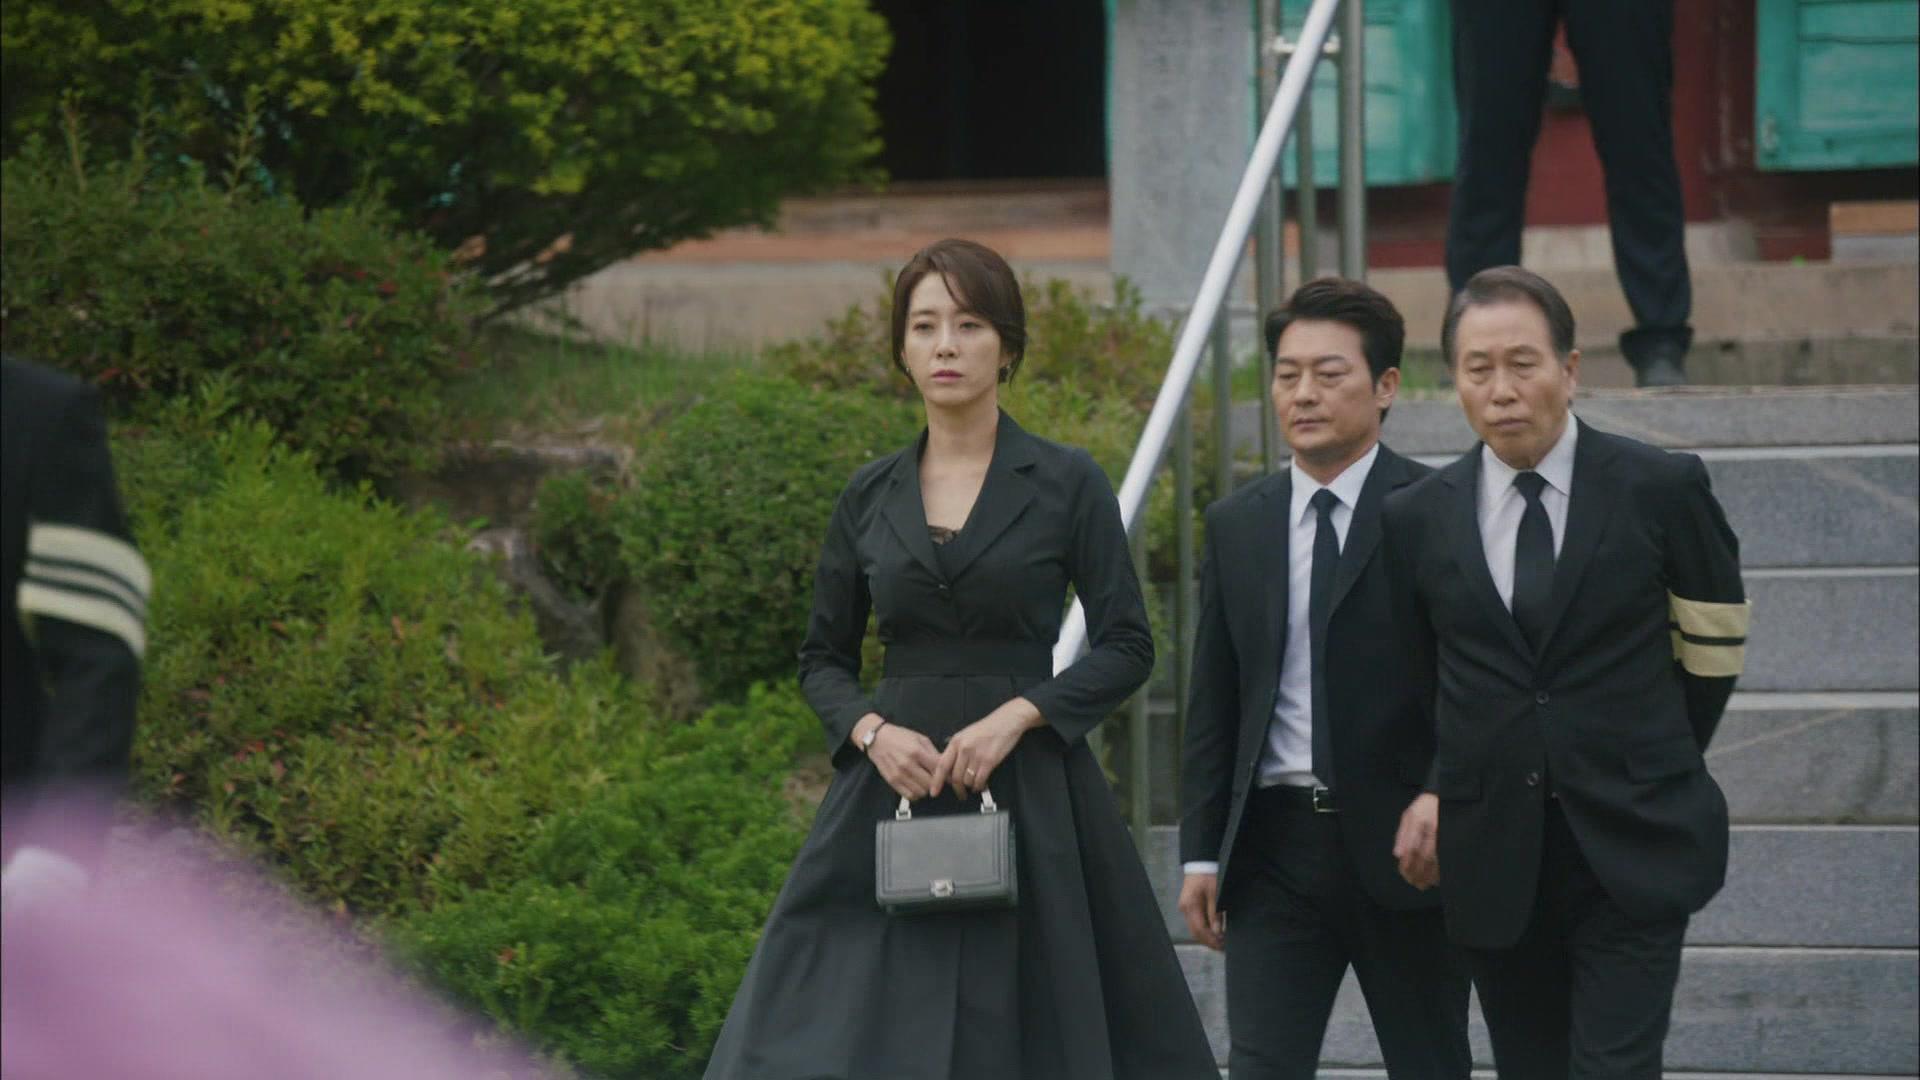 The K2 Episode 1 - THE K2 - Watch Full Episodes Free - Korea